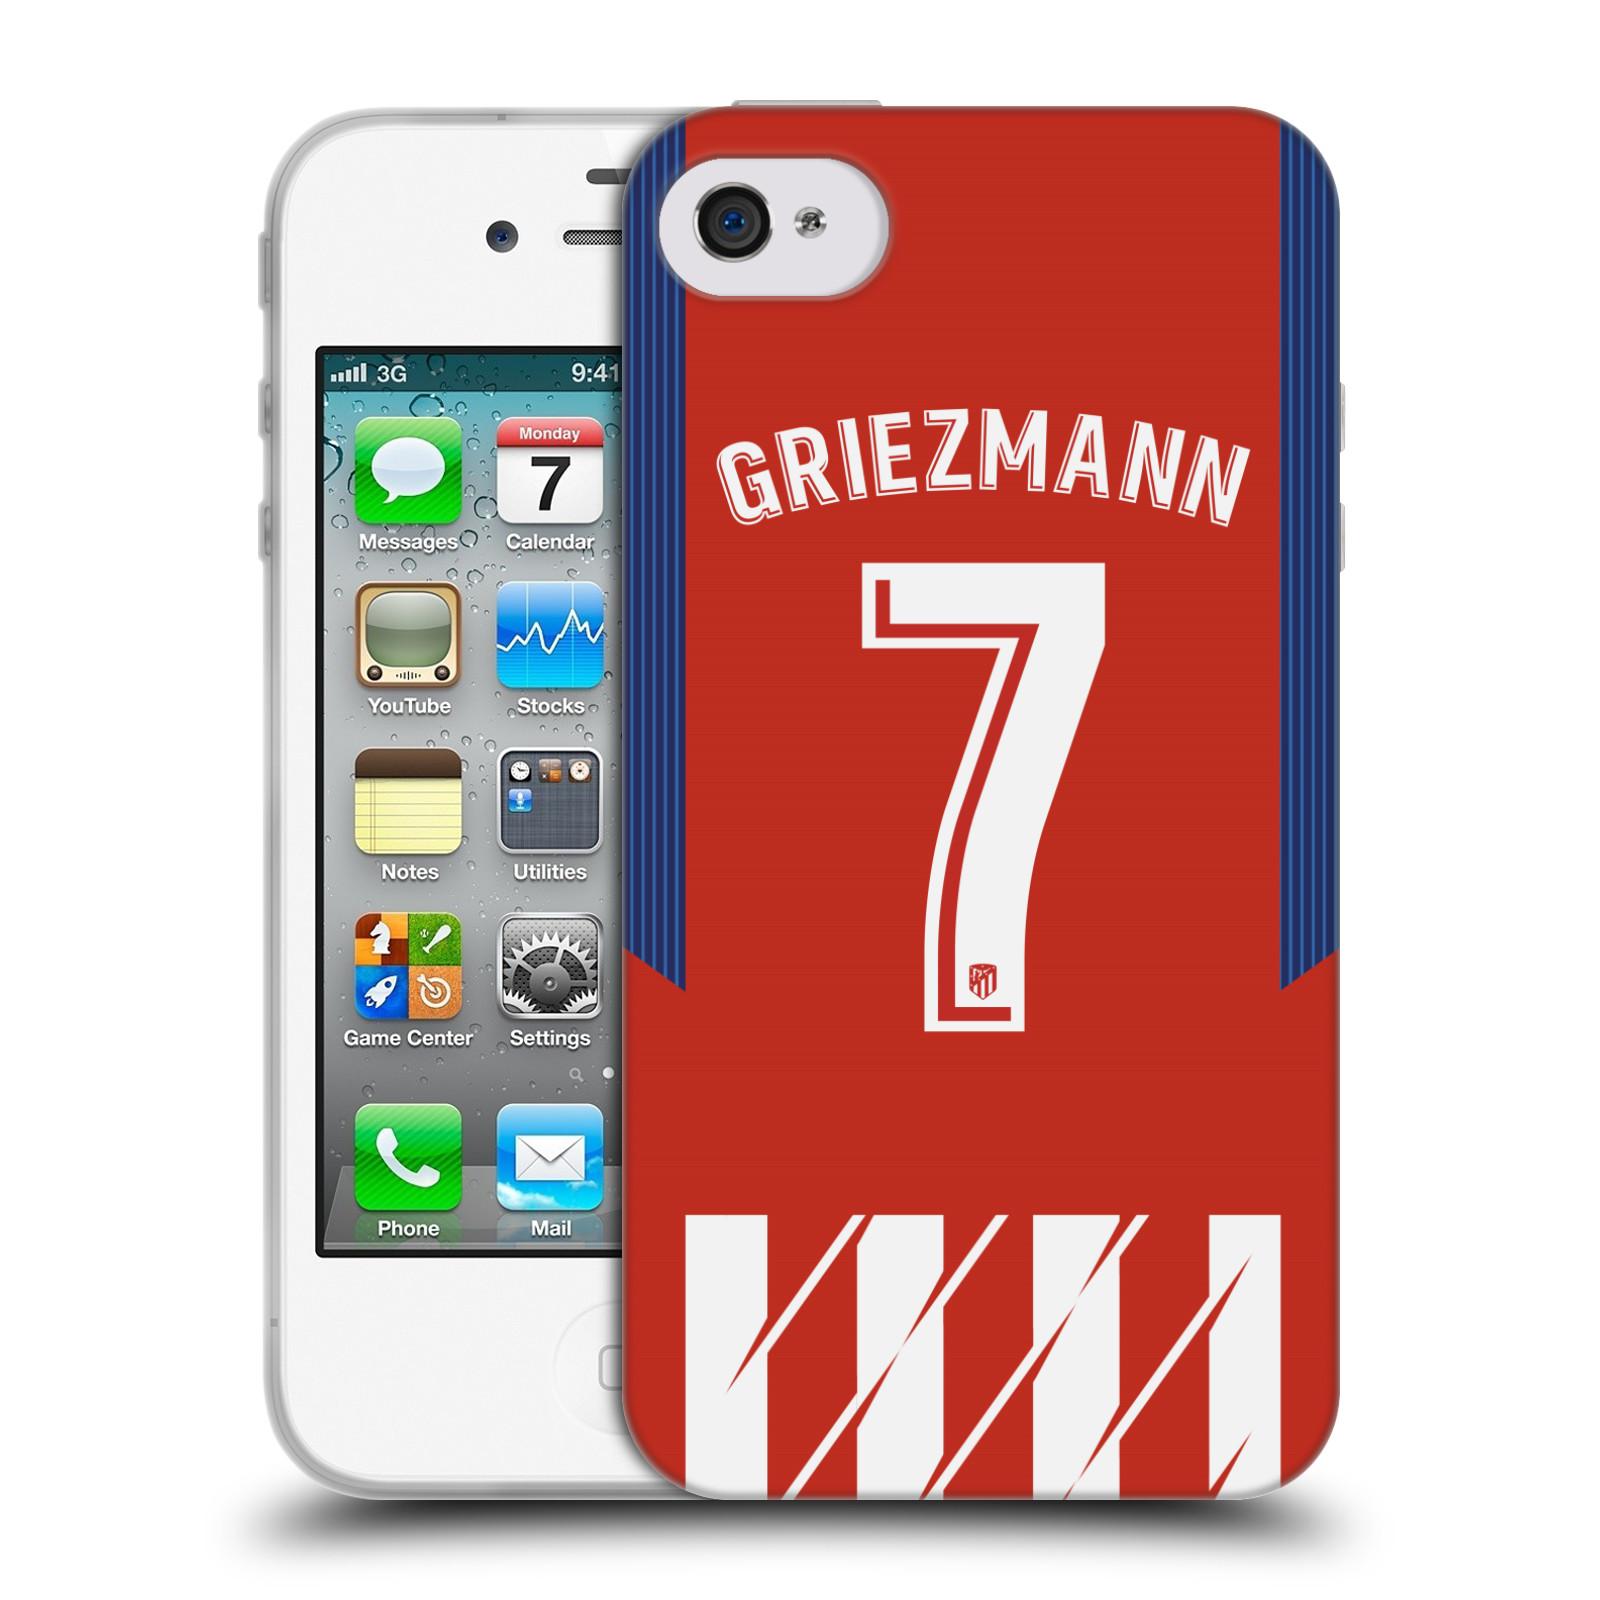 HEAD CASE silikonový obal na mobil Apple Iphone 4 Fotbalový klub Atlético Madrid dres Antoine Griezmann